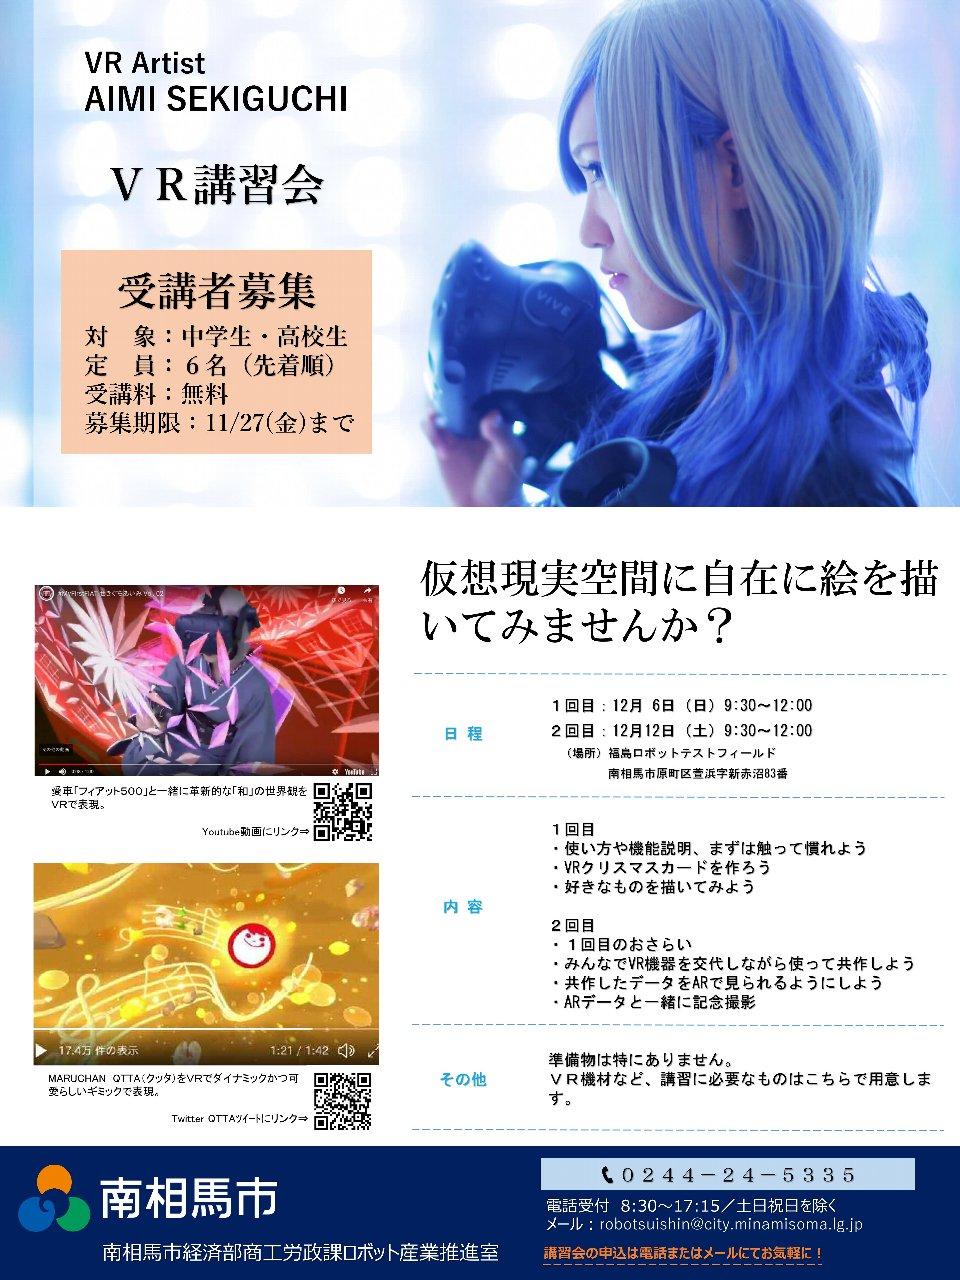 VR講習会 - 南相馬市